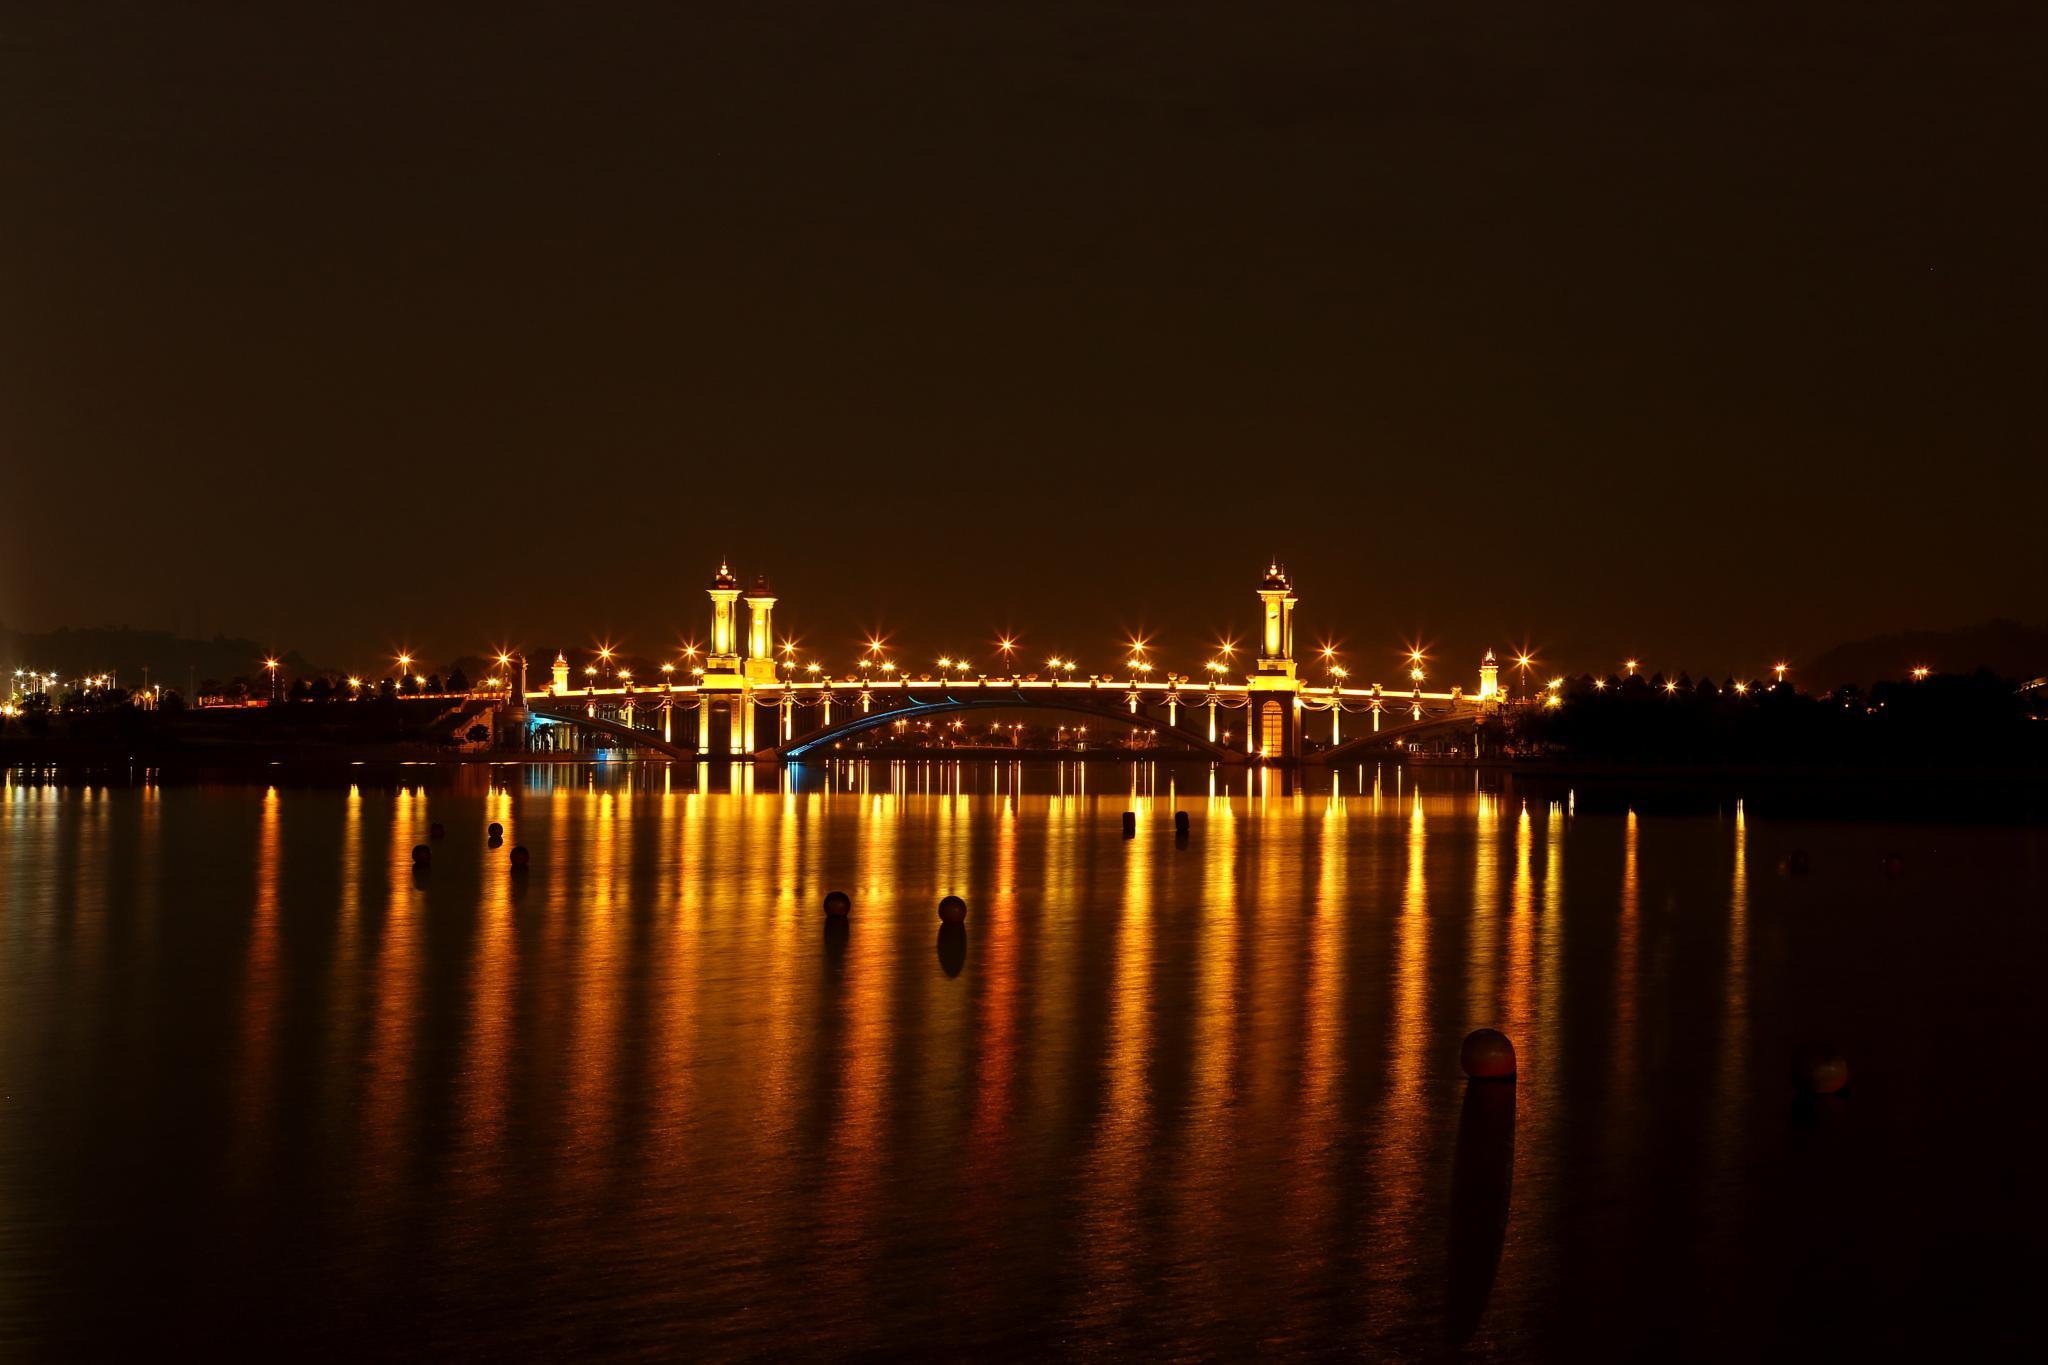 The Bridge by Burhanuddin